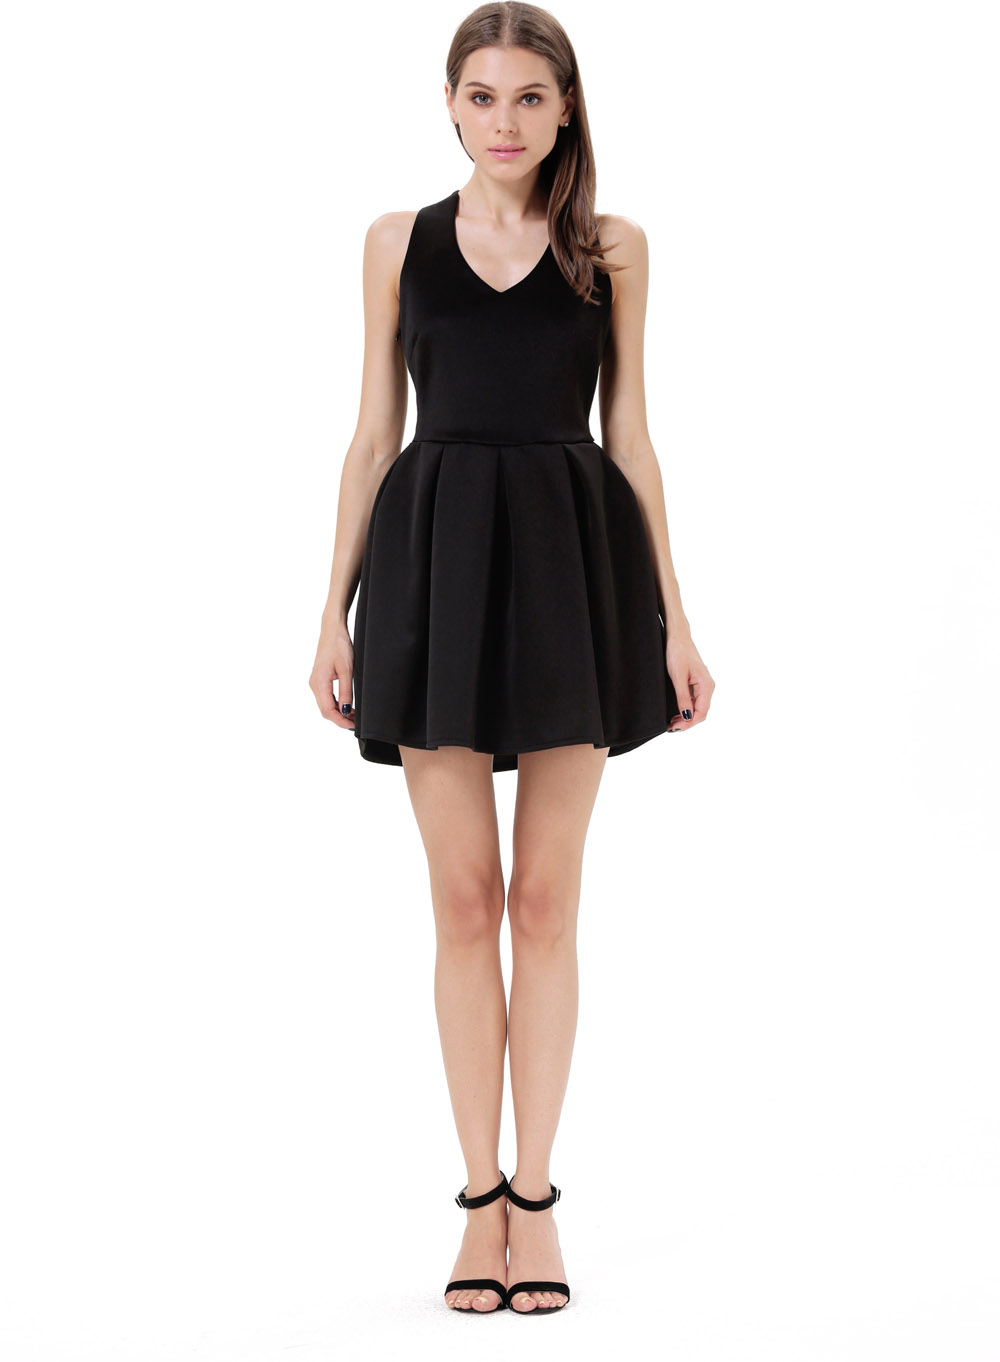 Black Criss Cross Backless Bow Pleated Dress - Sheinside.com